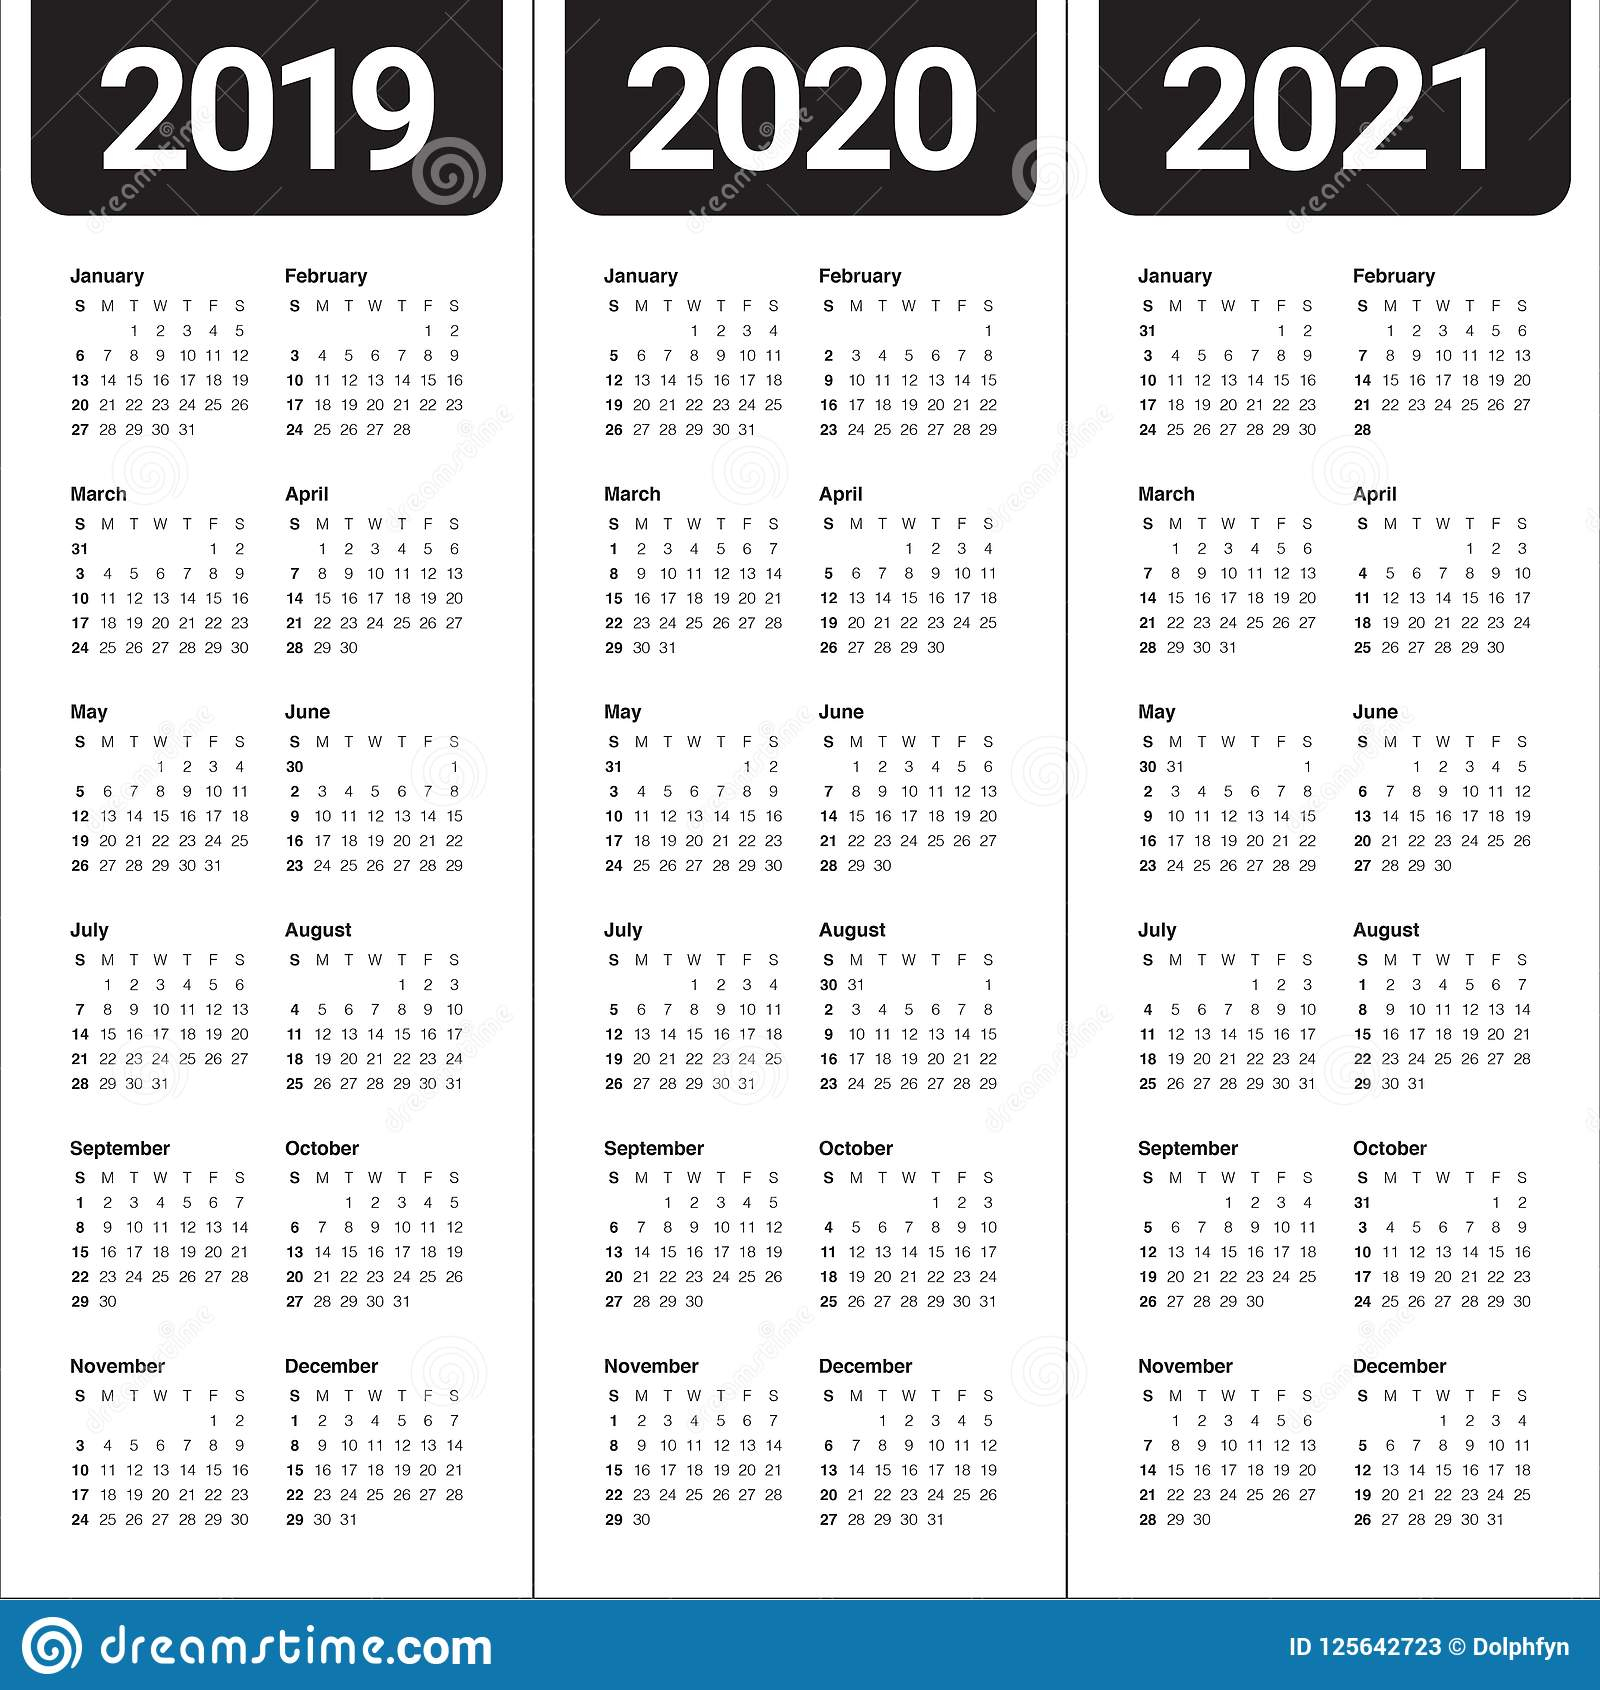 Calendar 2020 - 2021 Template